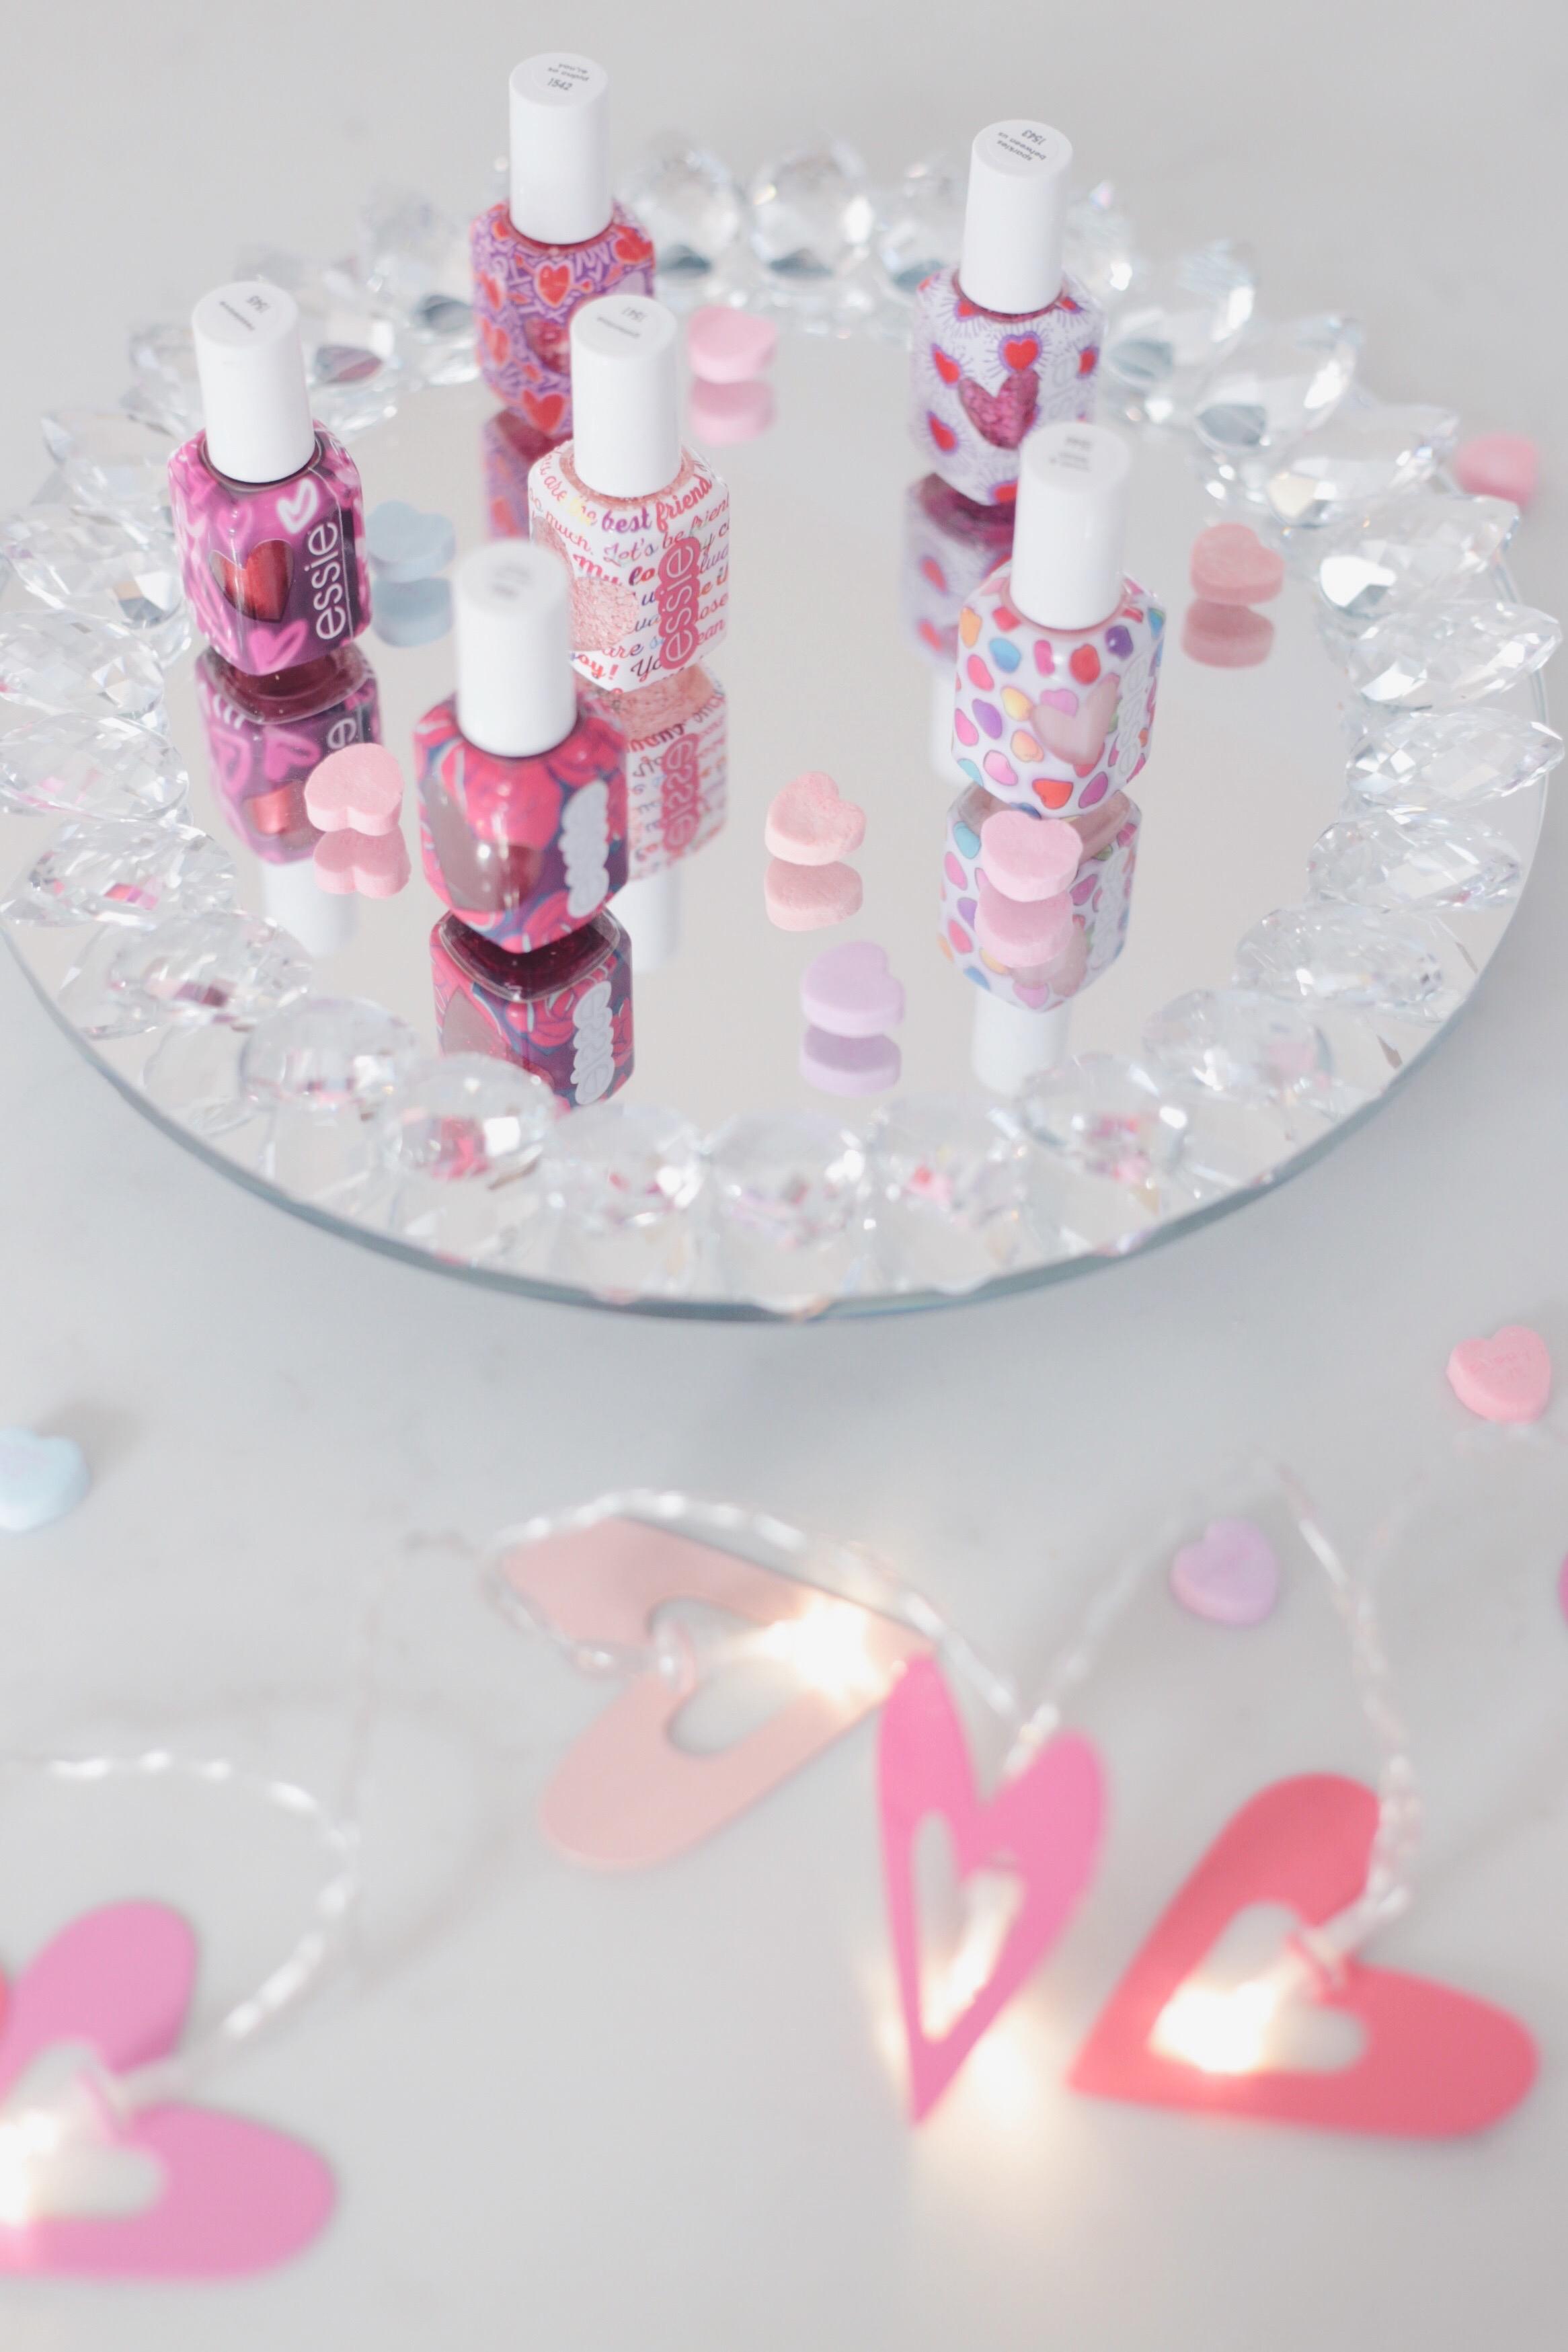 valentine's day manicure with essie - nail polish 2019 pinteresting plans blog